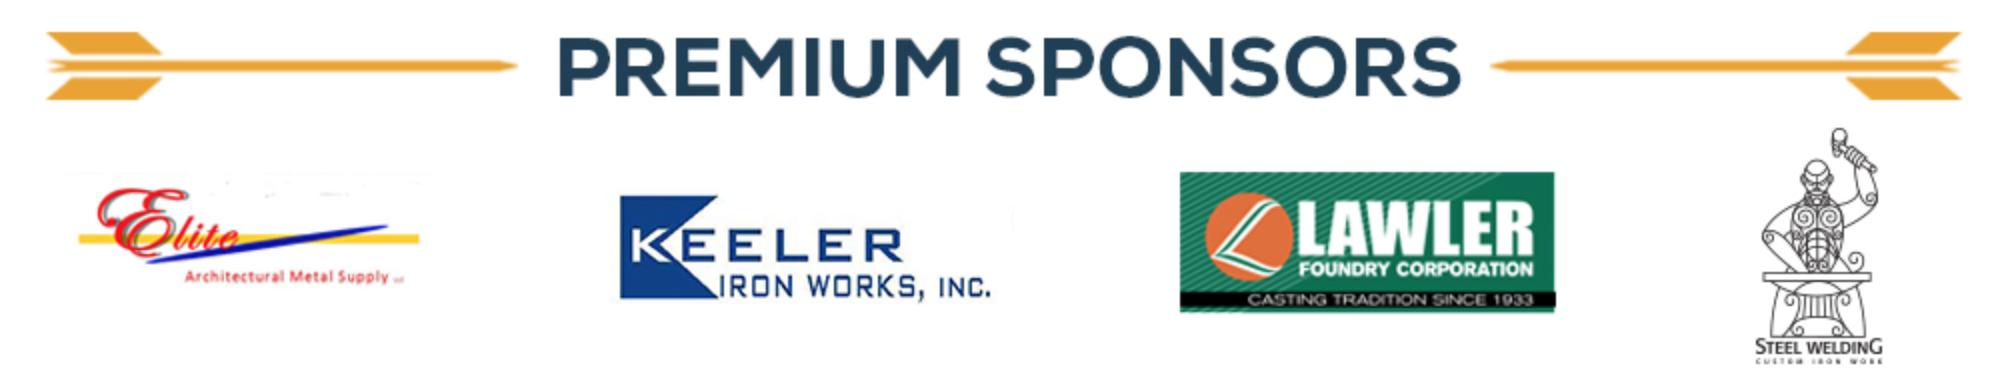 METALfab Premium Sponsors